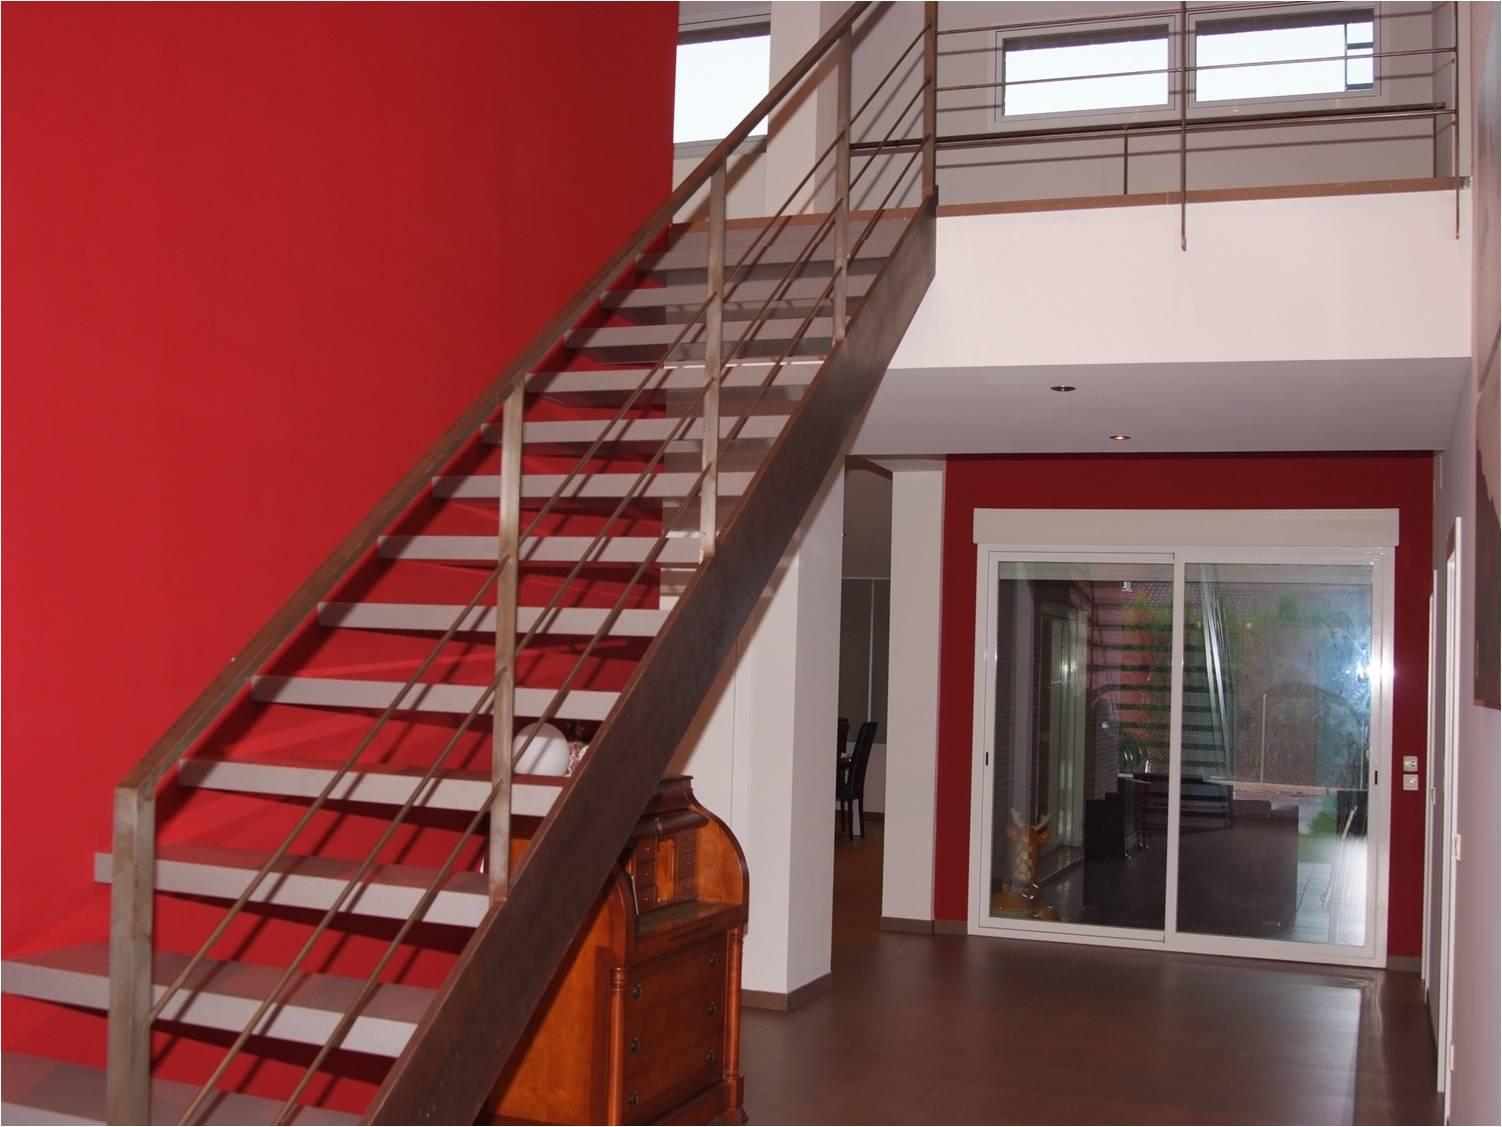 Dise o de escaleras maxalto for Soluciones para escaleras